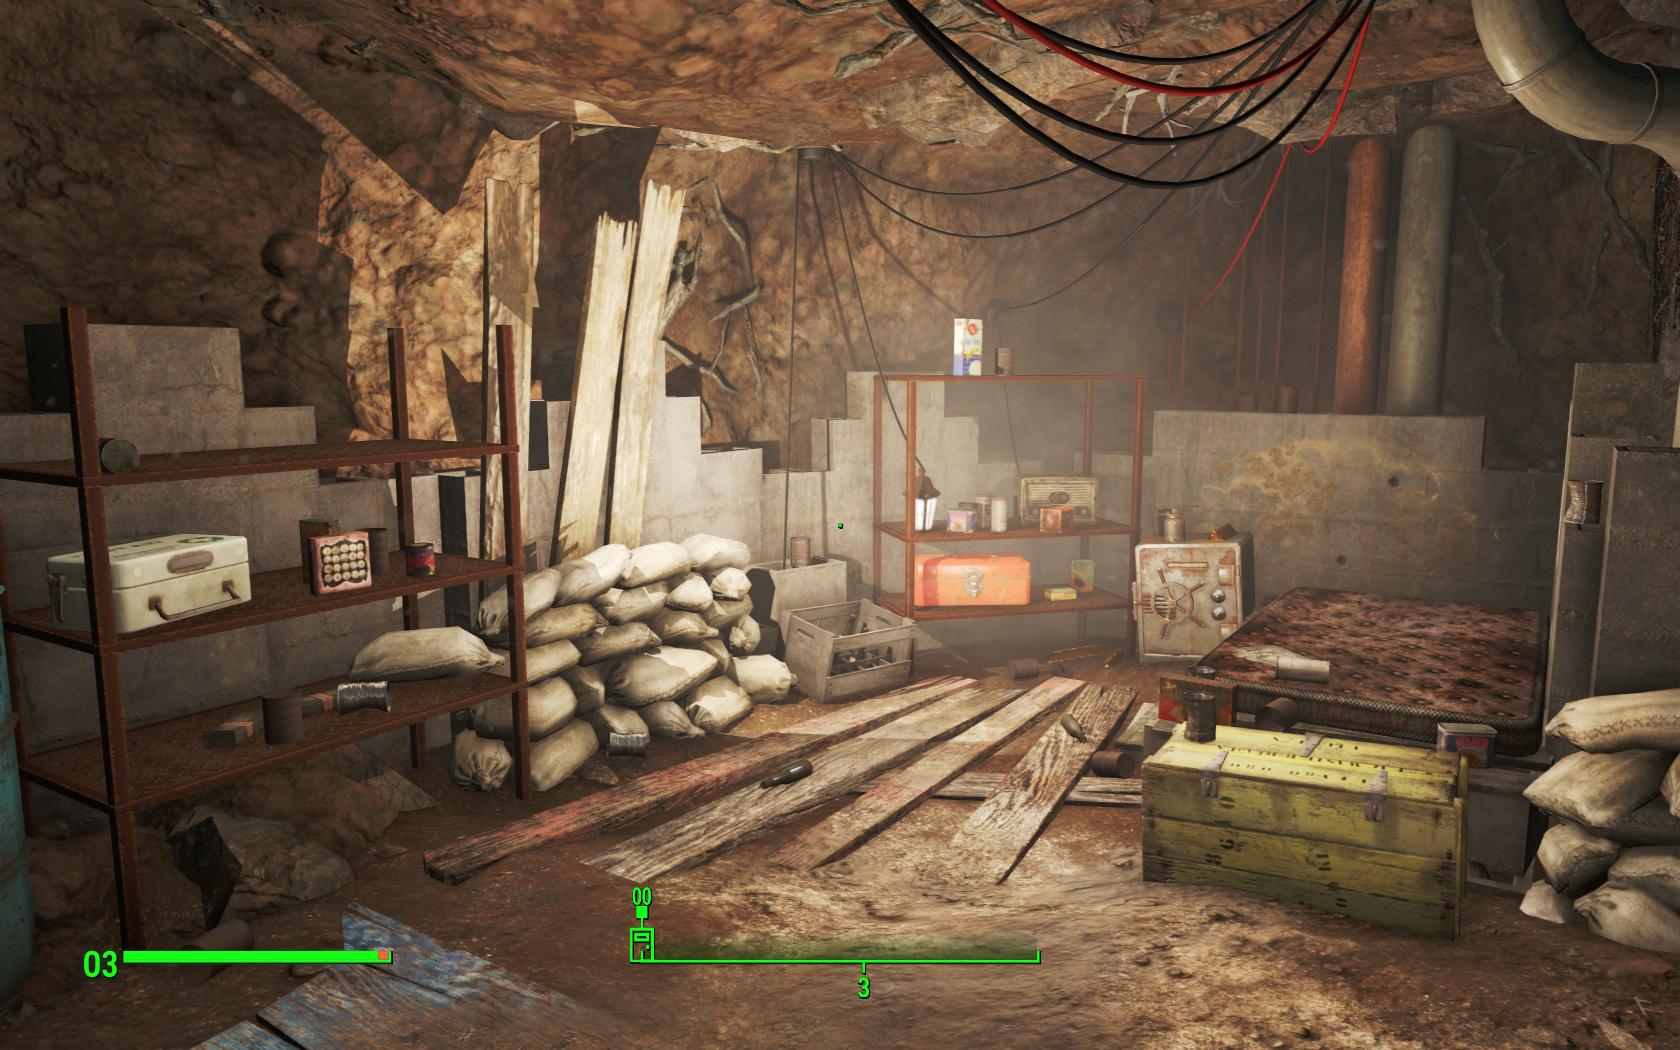 Подвал (Сэнкчуари) - Fallout 4 Подвал